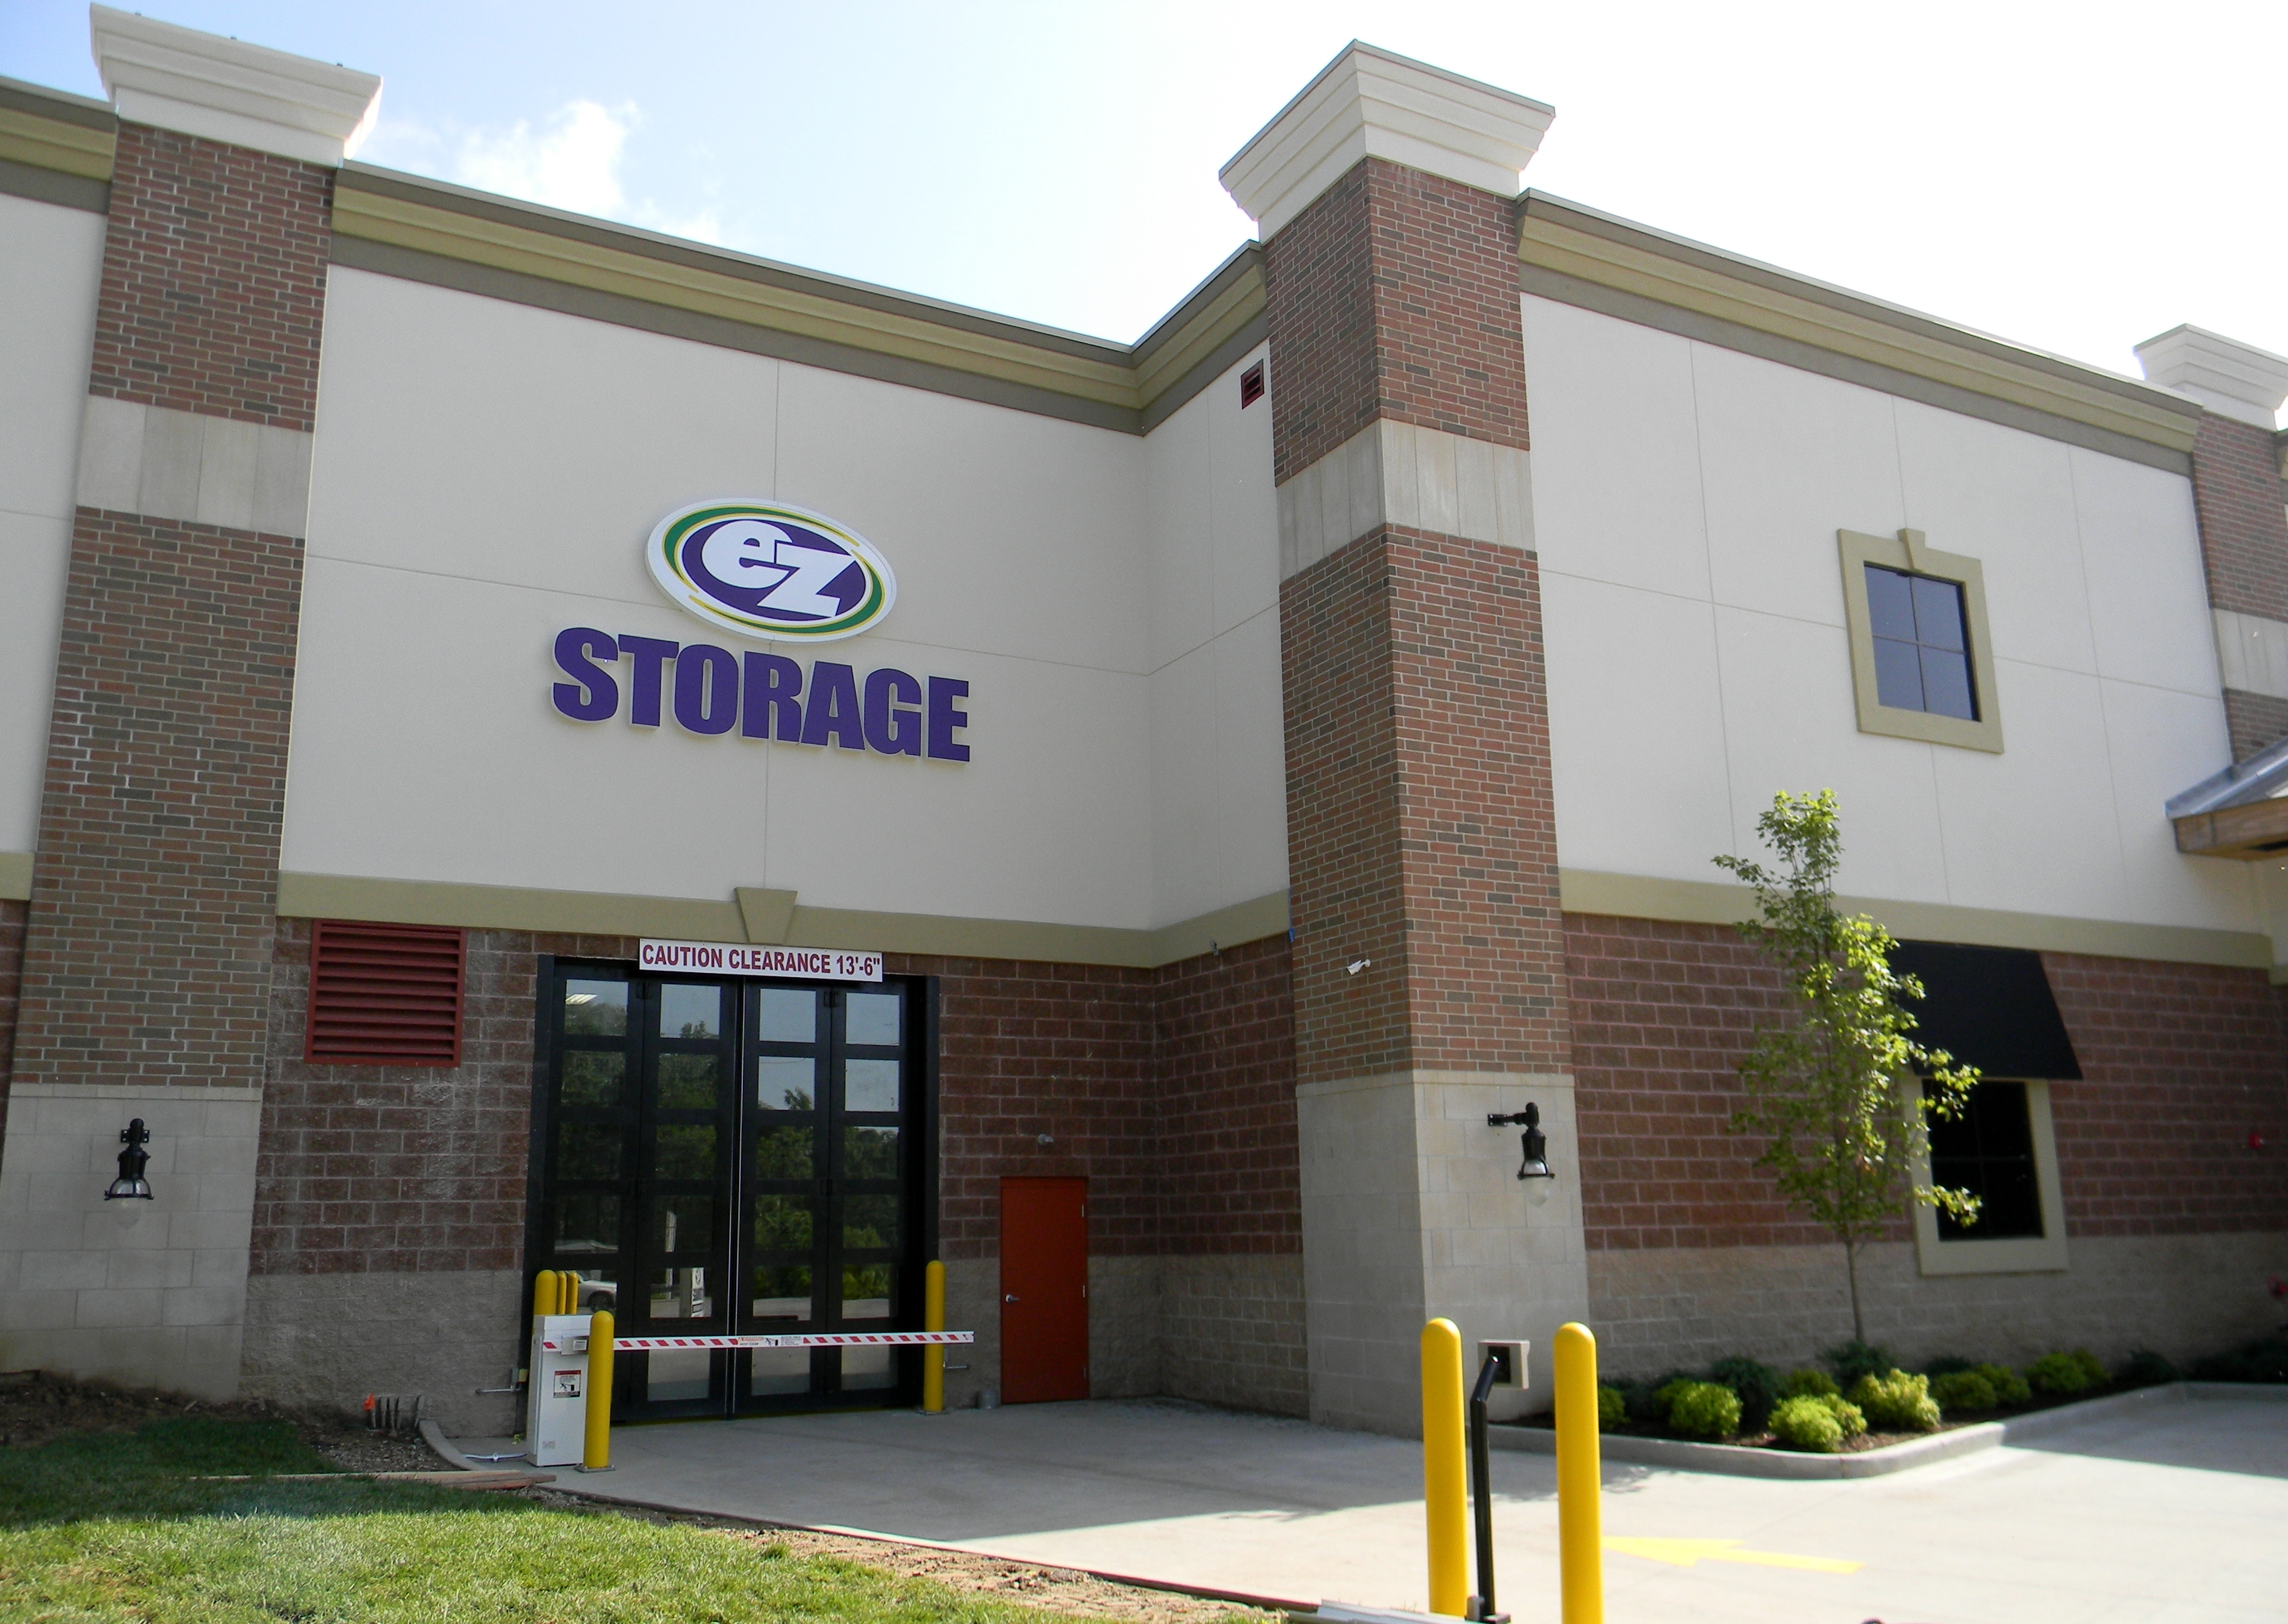 EZ Storage® 9715 Manchester Road St. Louis, MO Warehouses Self Storage    MapQuest